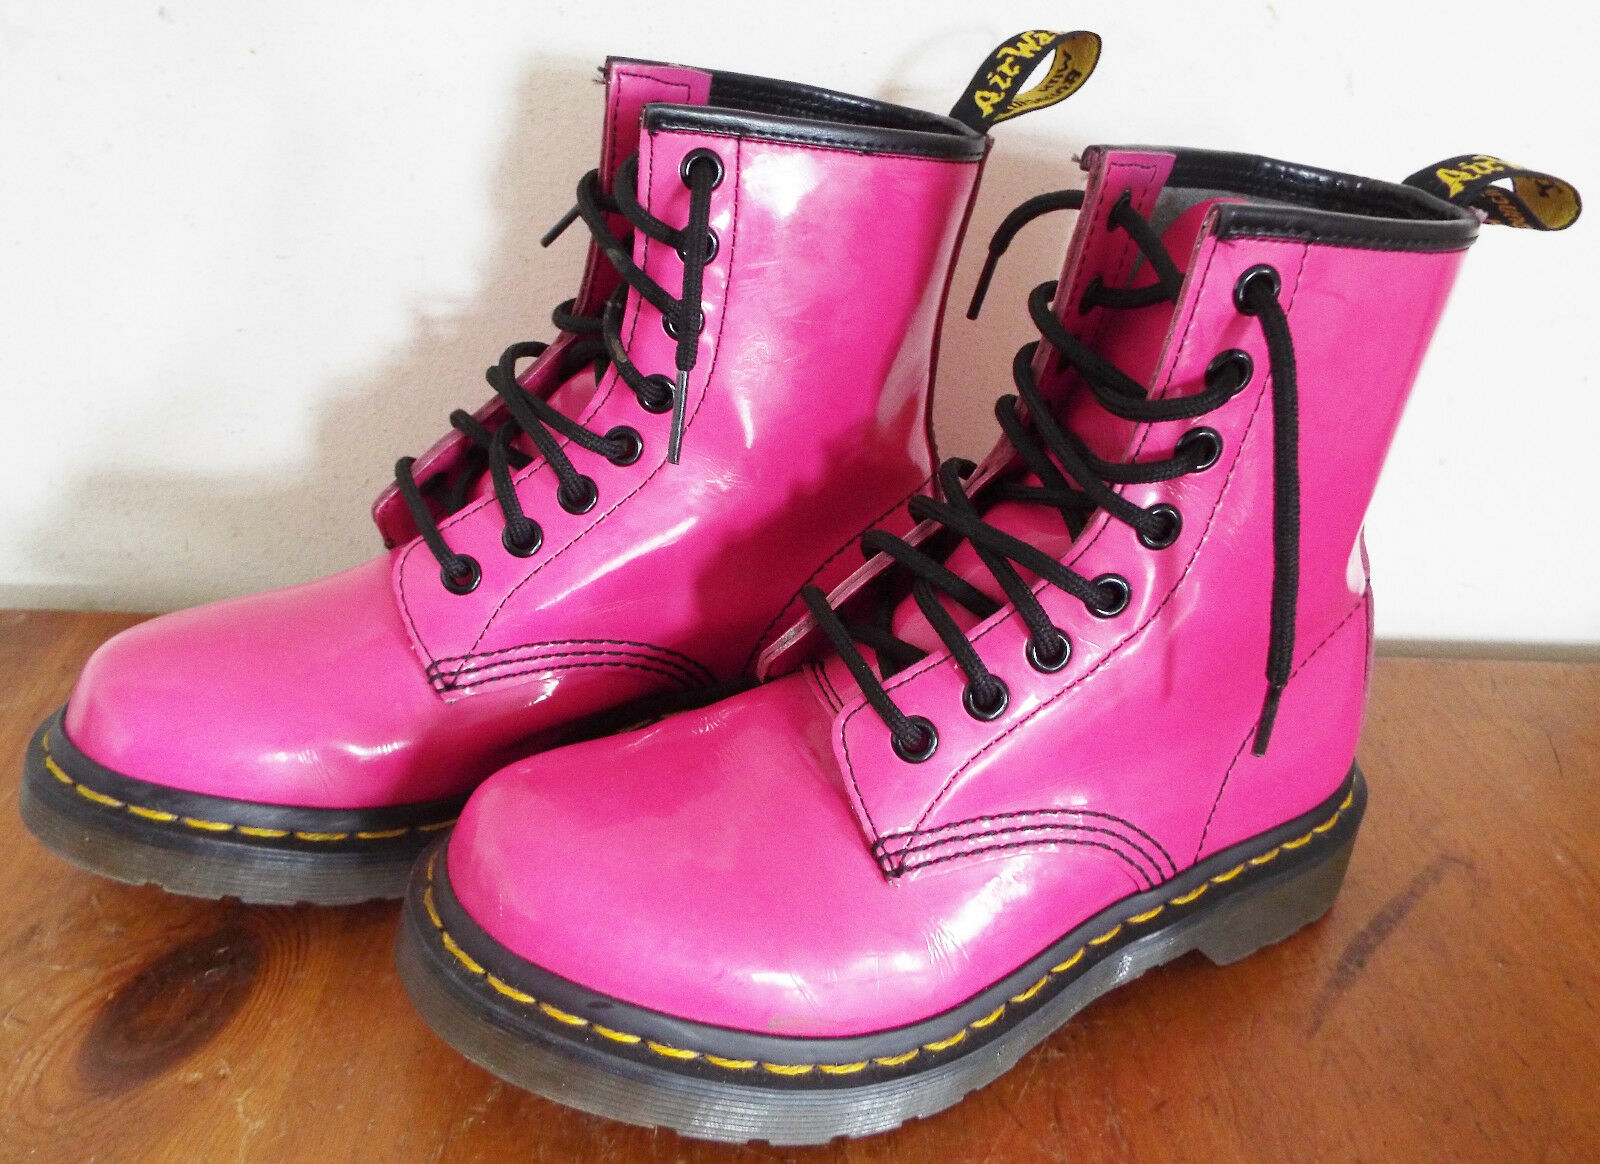 Dr Martens Stiefel Pink UK Größe 3 Girls/Damenschuhe 36 L EU / 5 US L 36 - 1460W Air Wair 4f9360